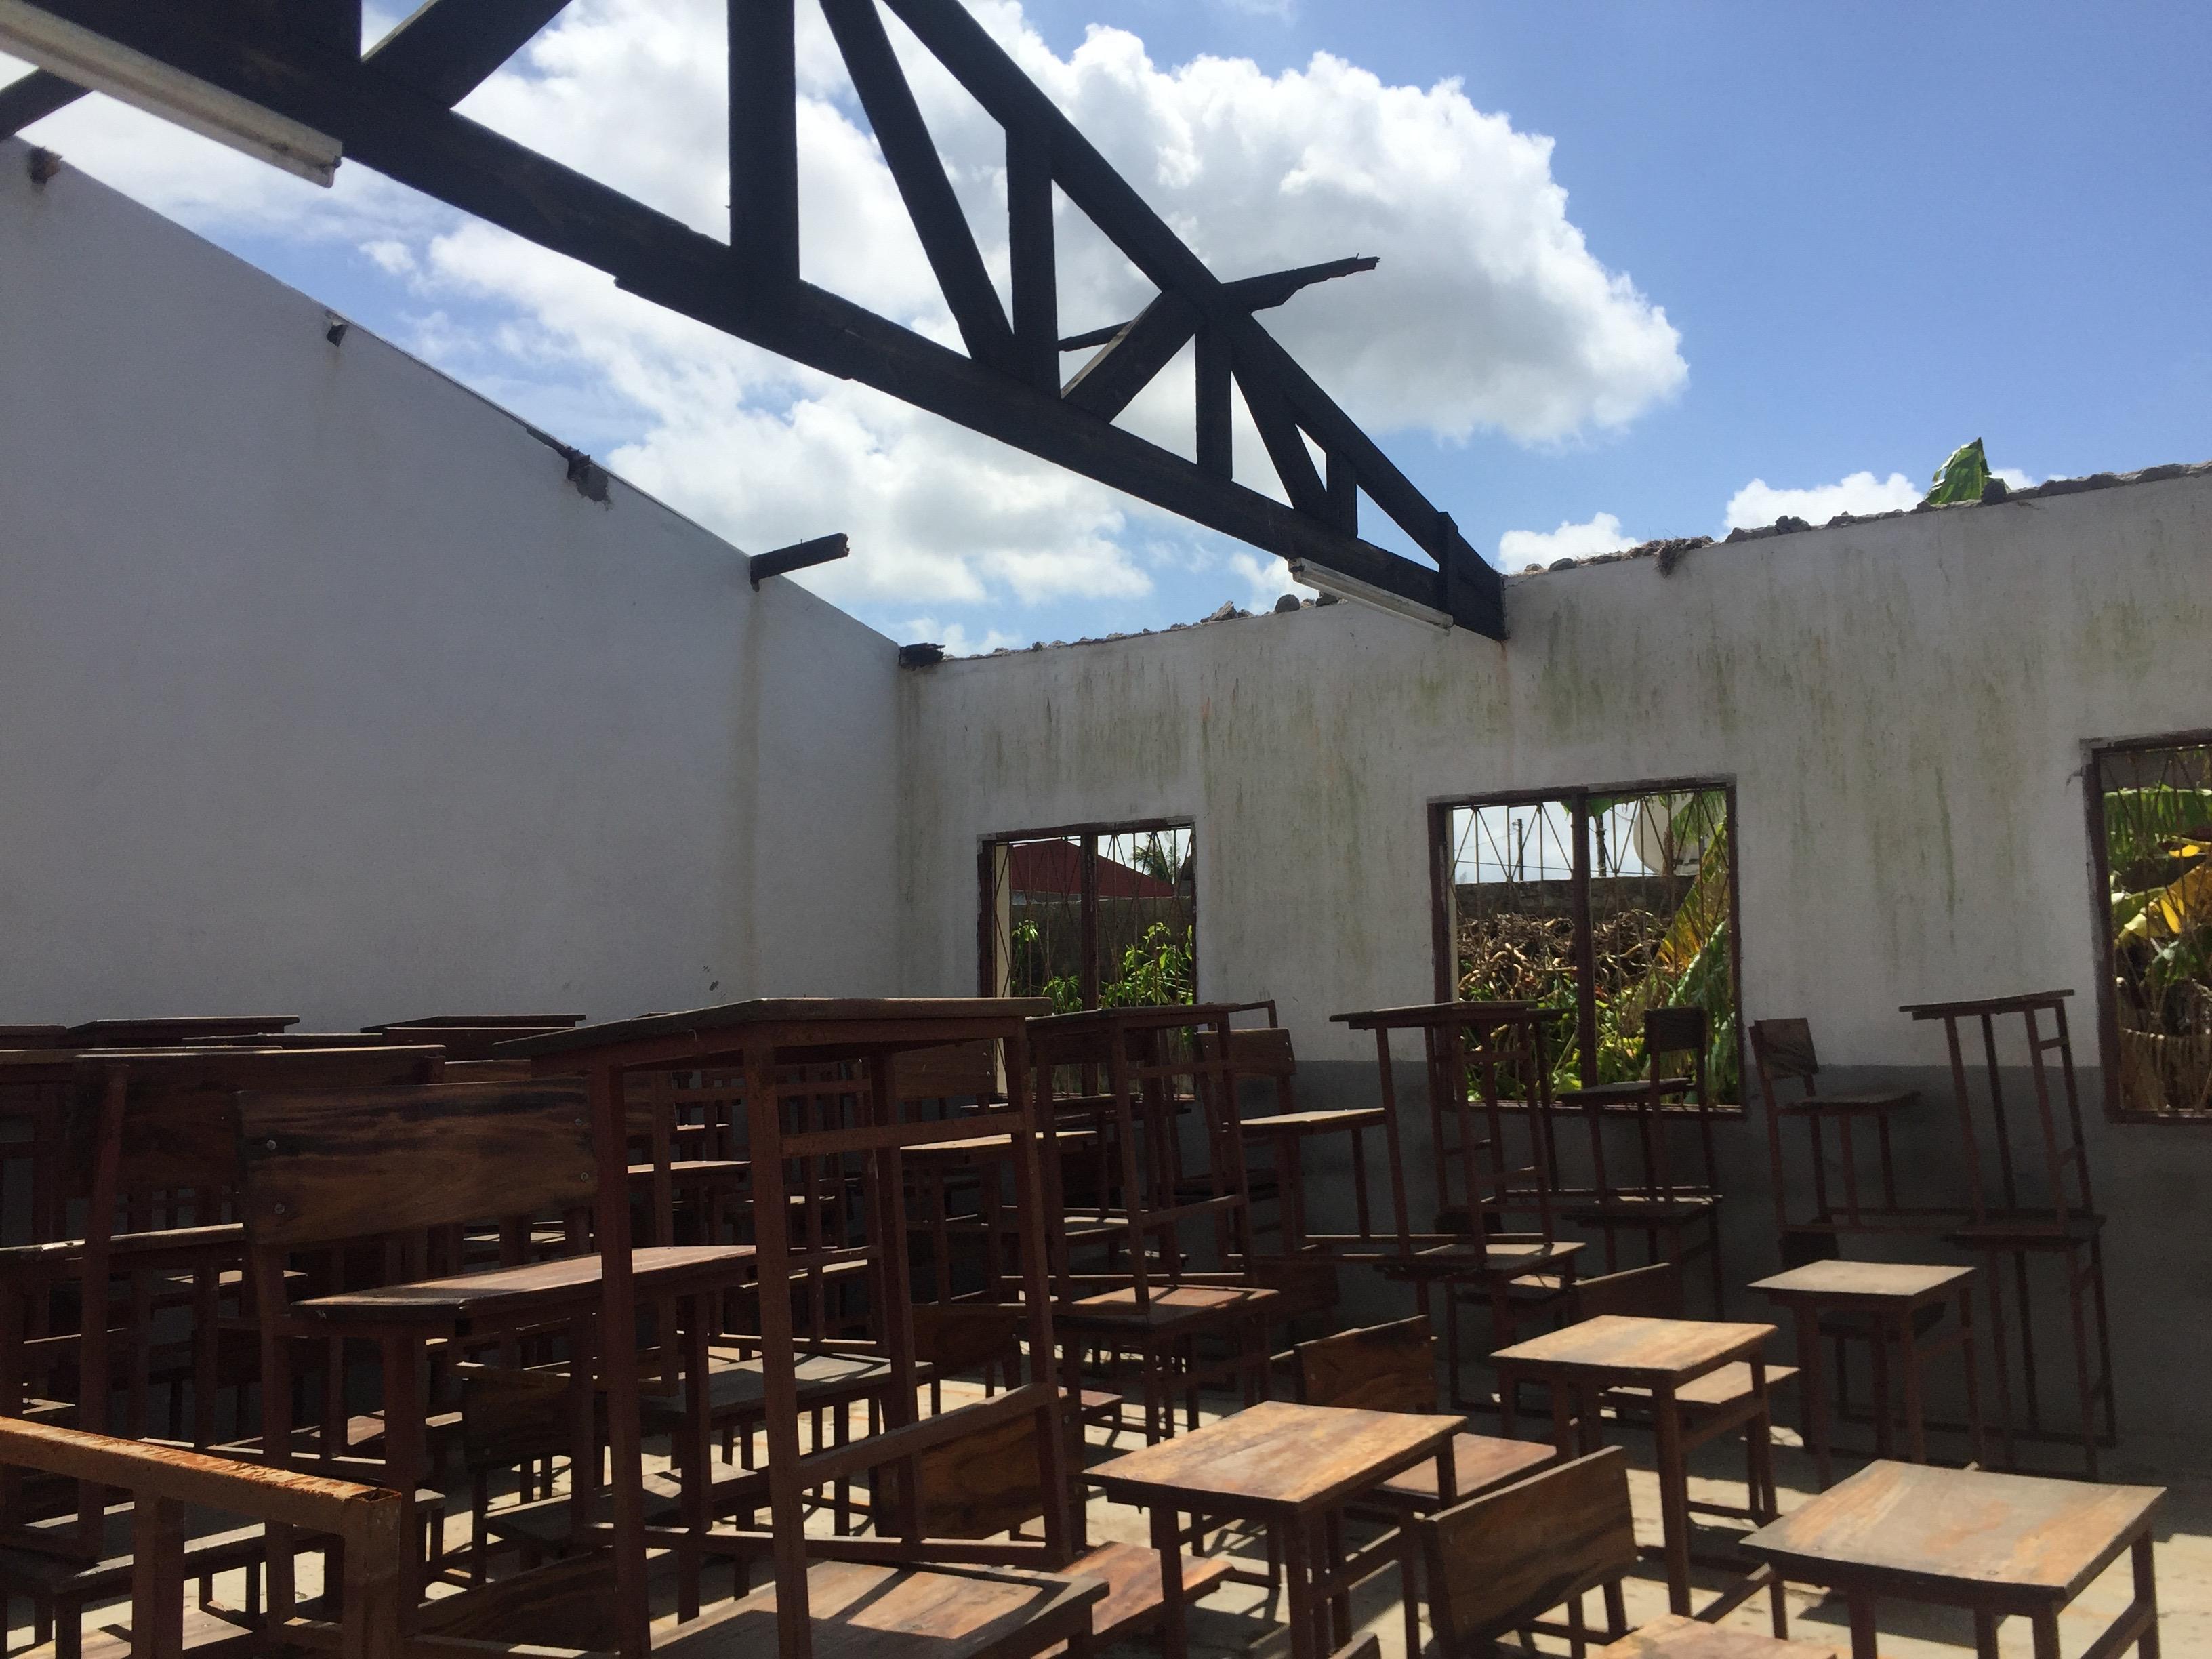 MZ_CicloneIdai_Beira_EscolaSagradaFamilia_032019@FEC (8)